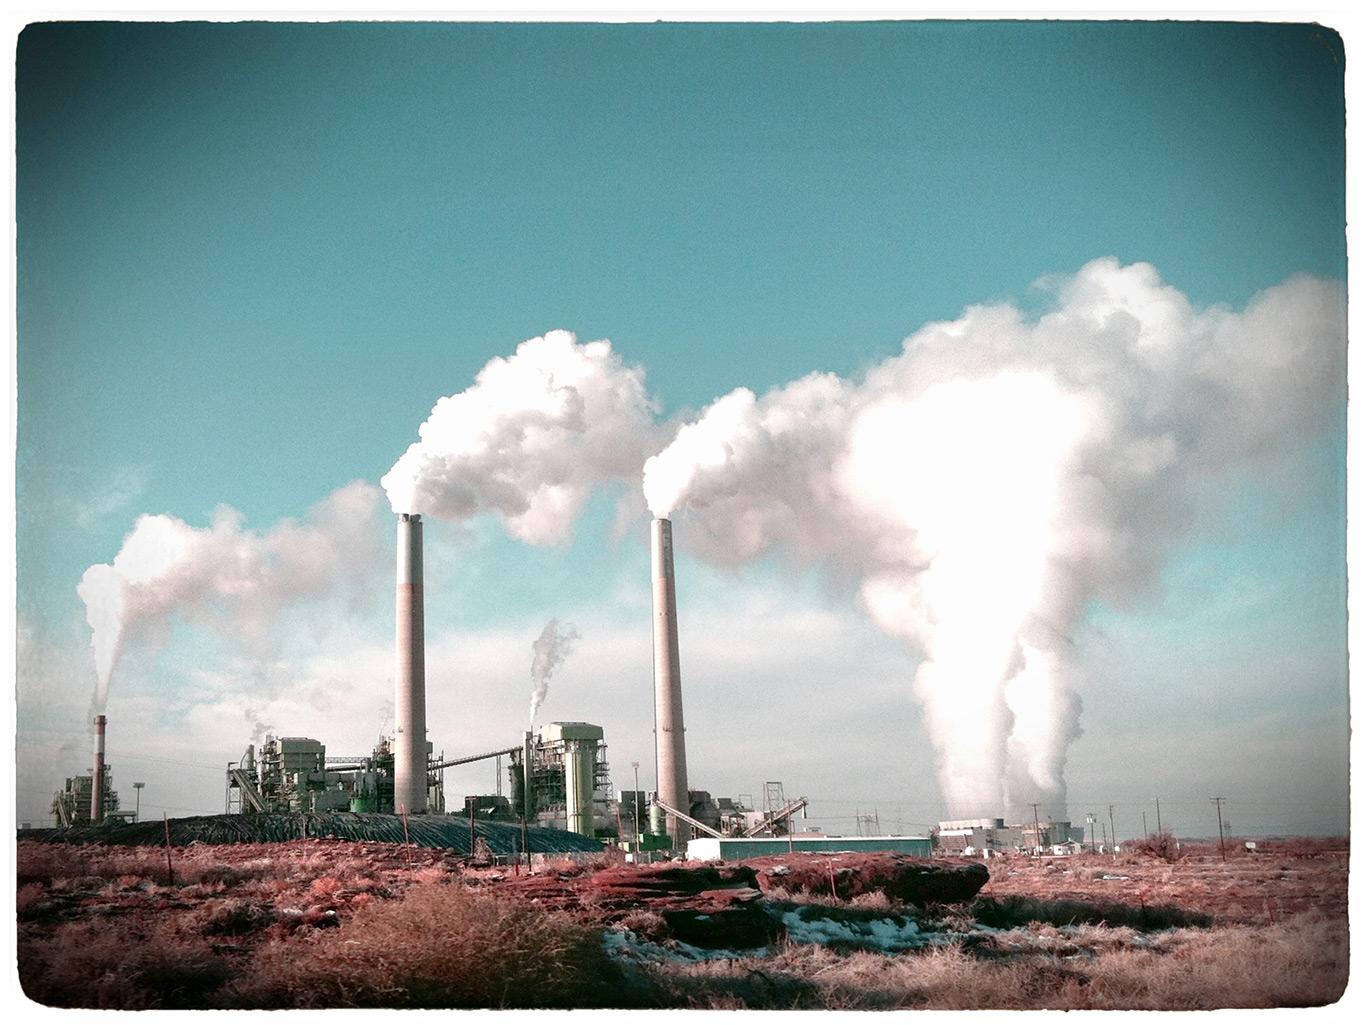 Industry in the Desert